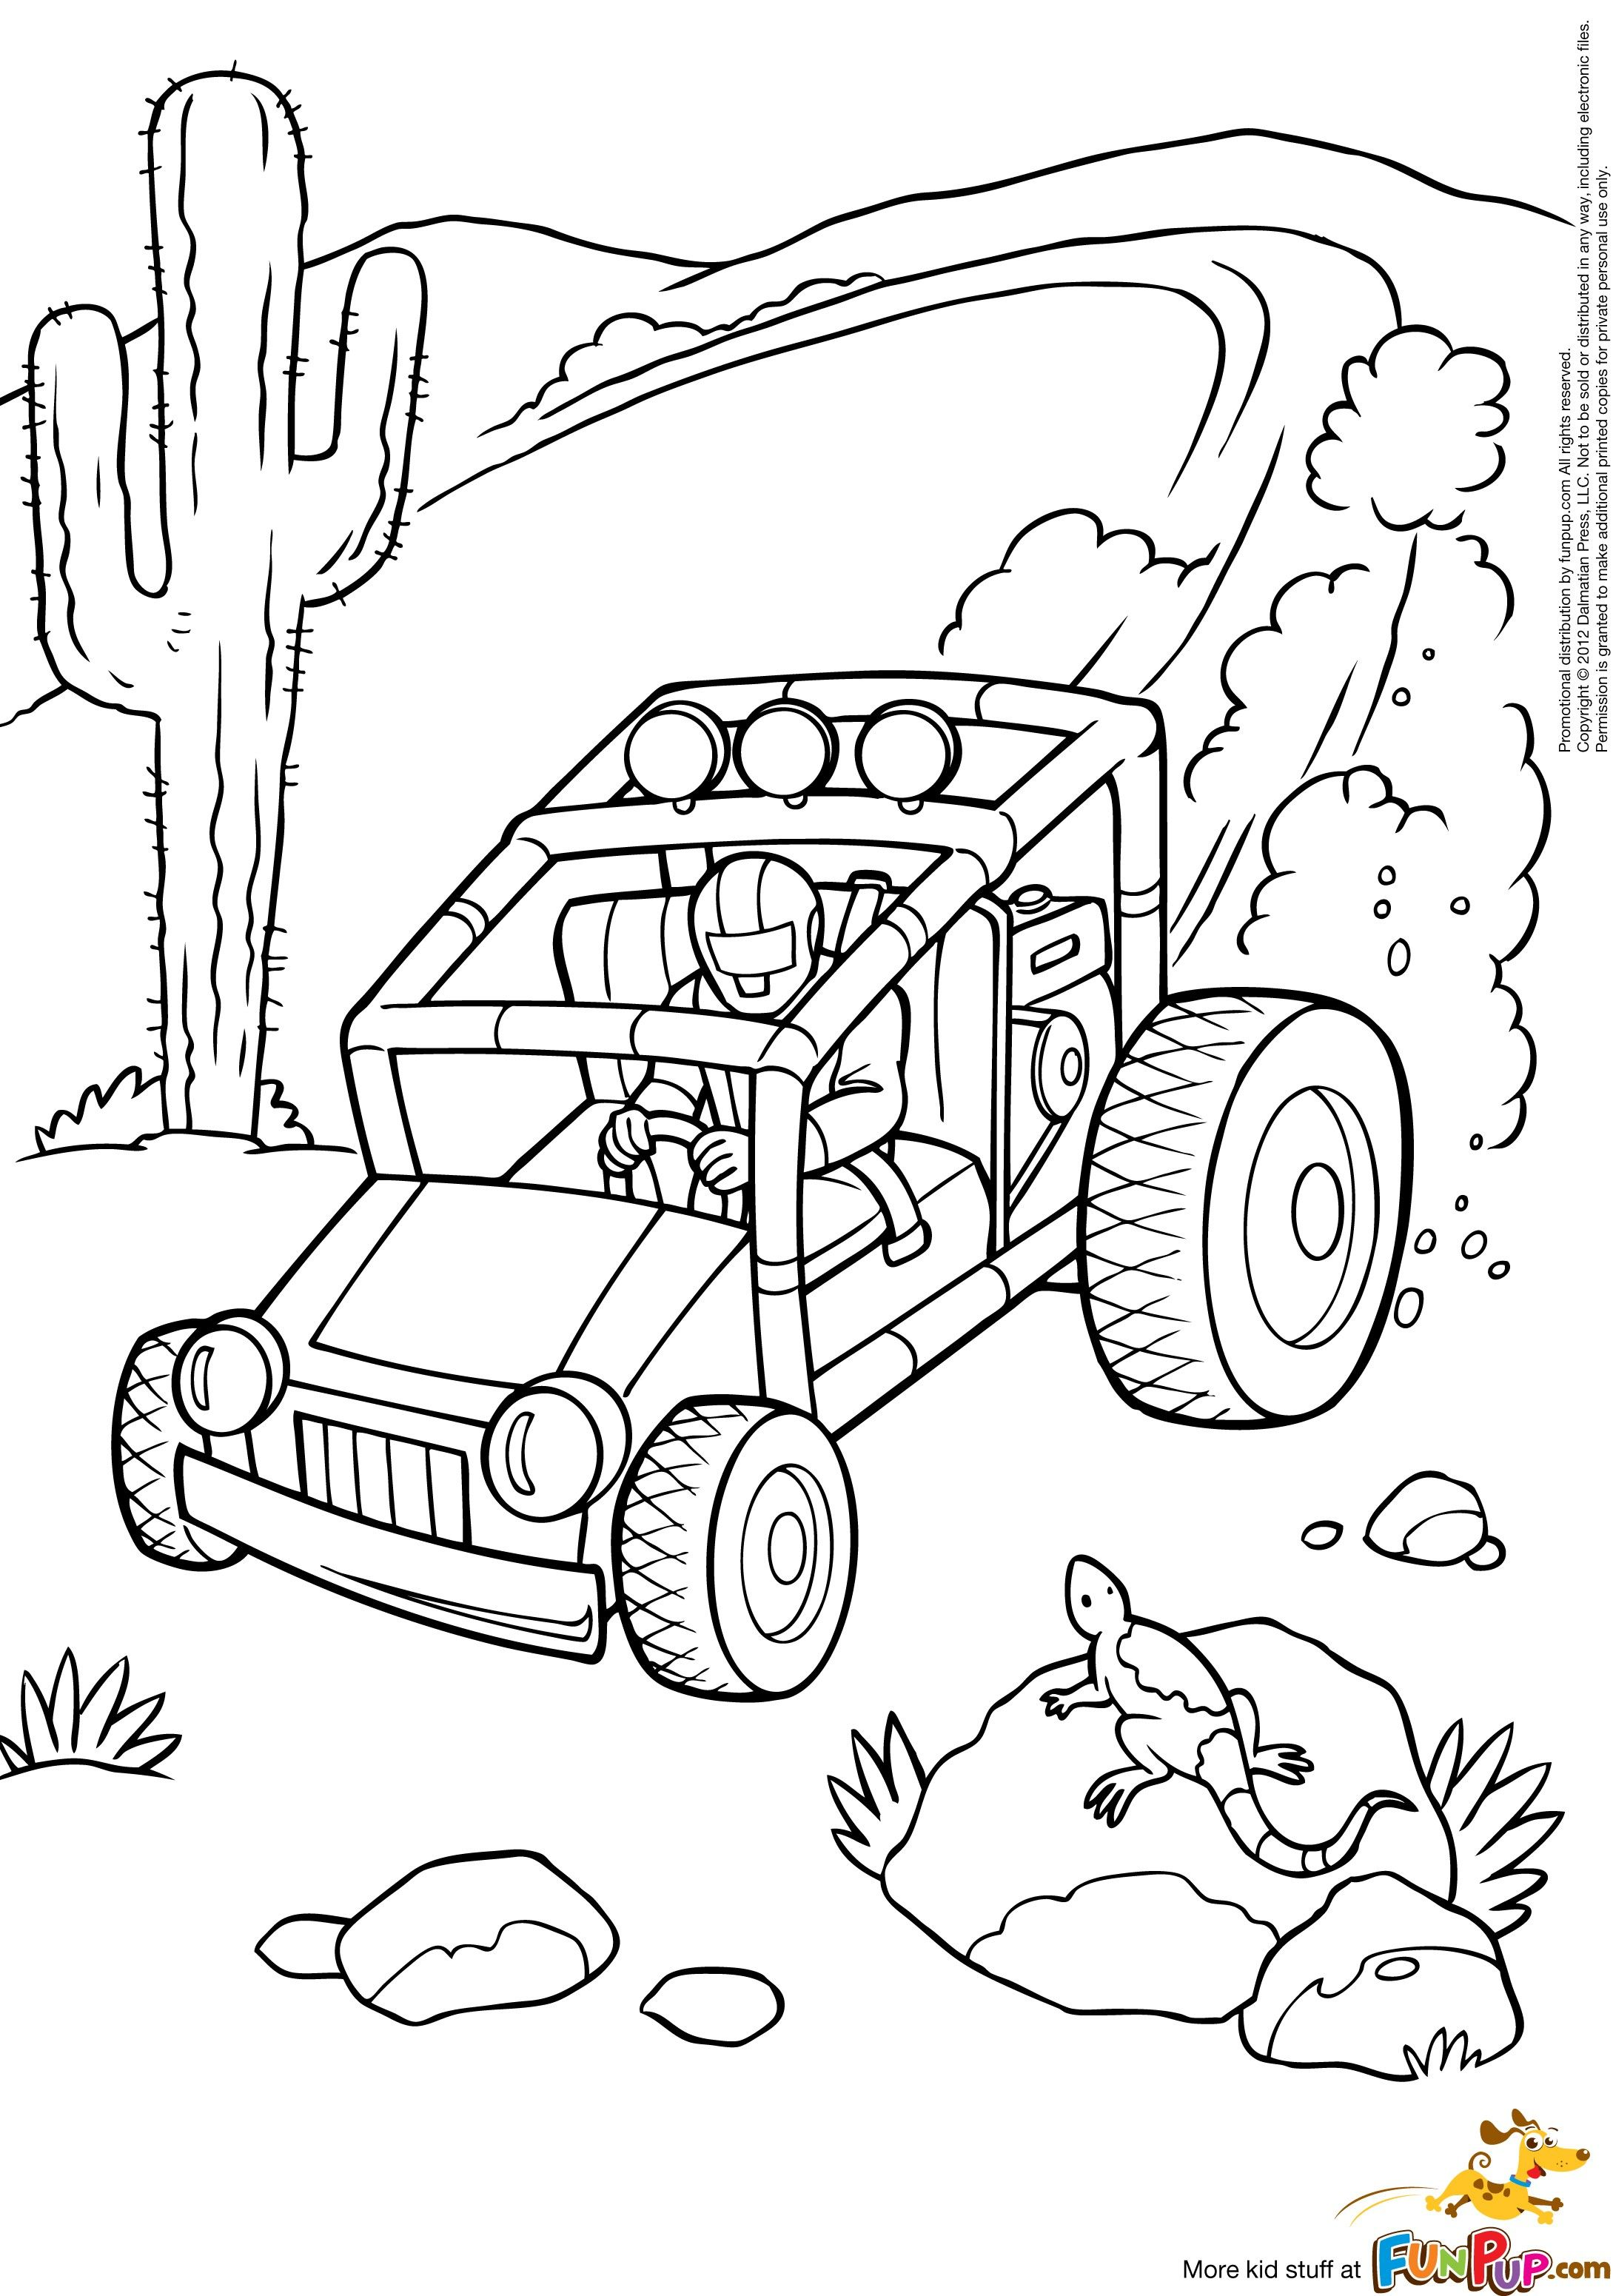 Dune Buggy Coloring Page : buggy, coloring, Buggy, Coloring, Pages, Pages,, Buggy,